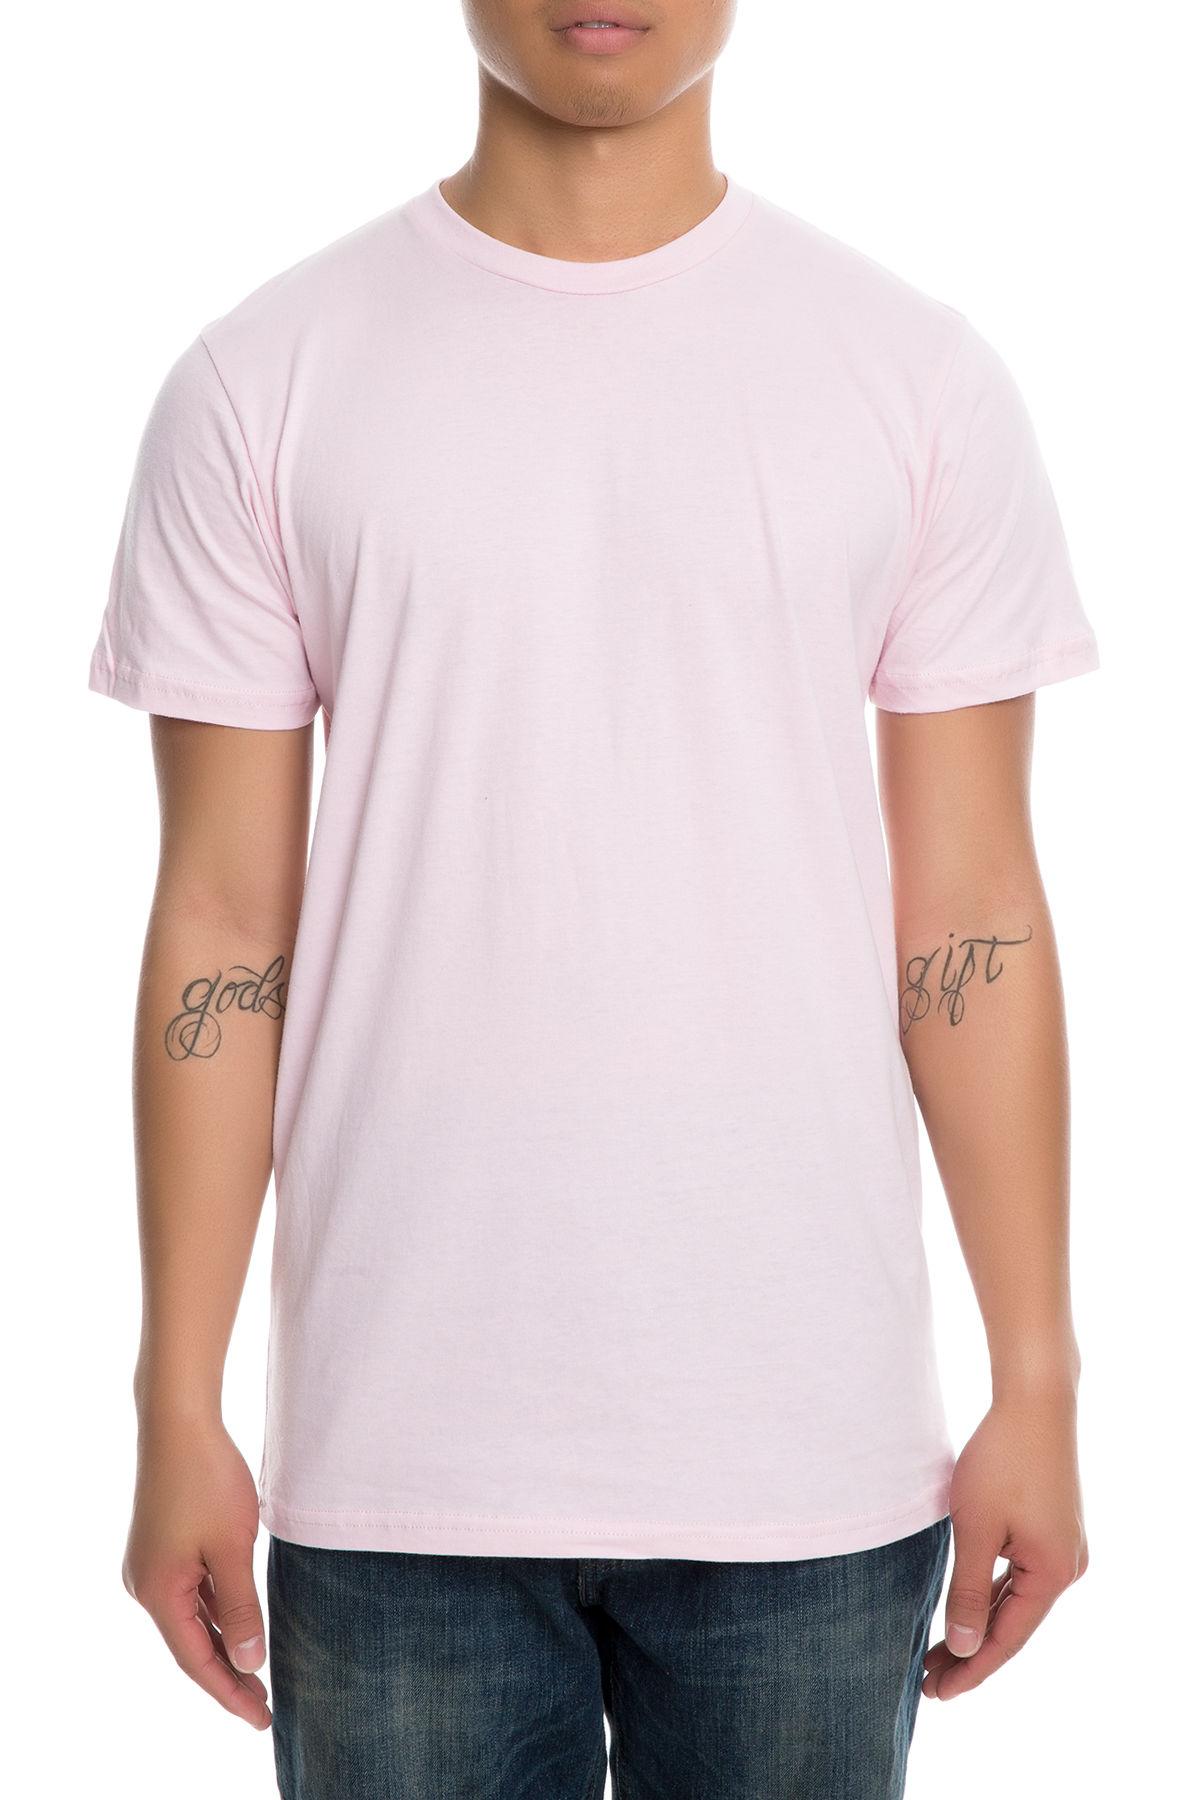 Image of The Men's Short Sleeve Crew in Light Pink